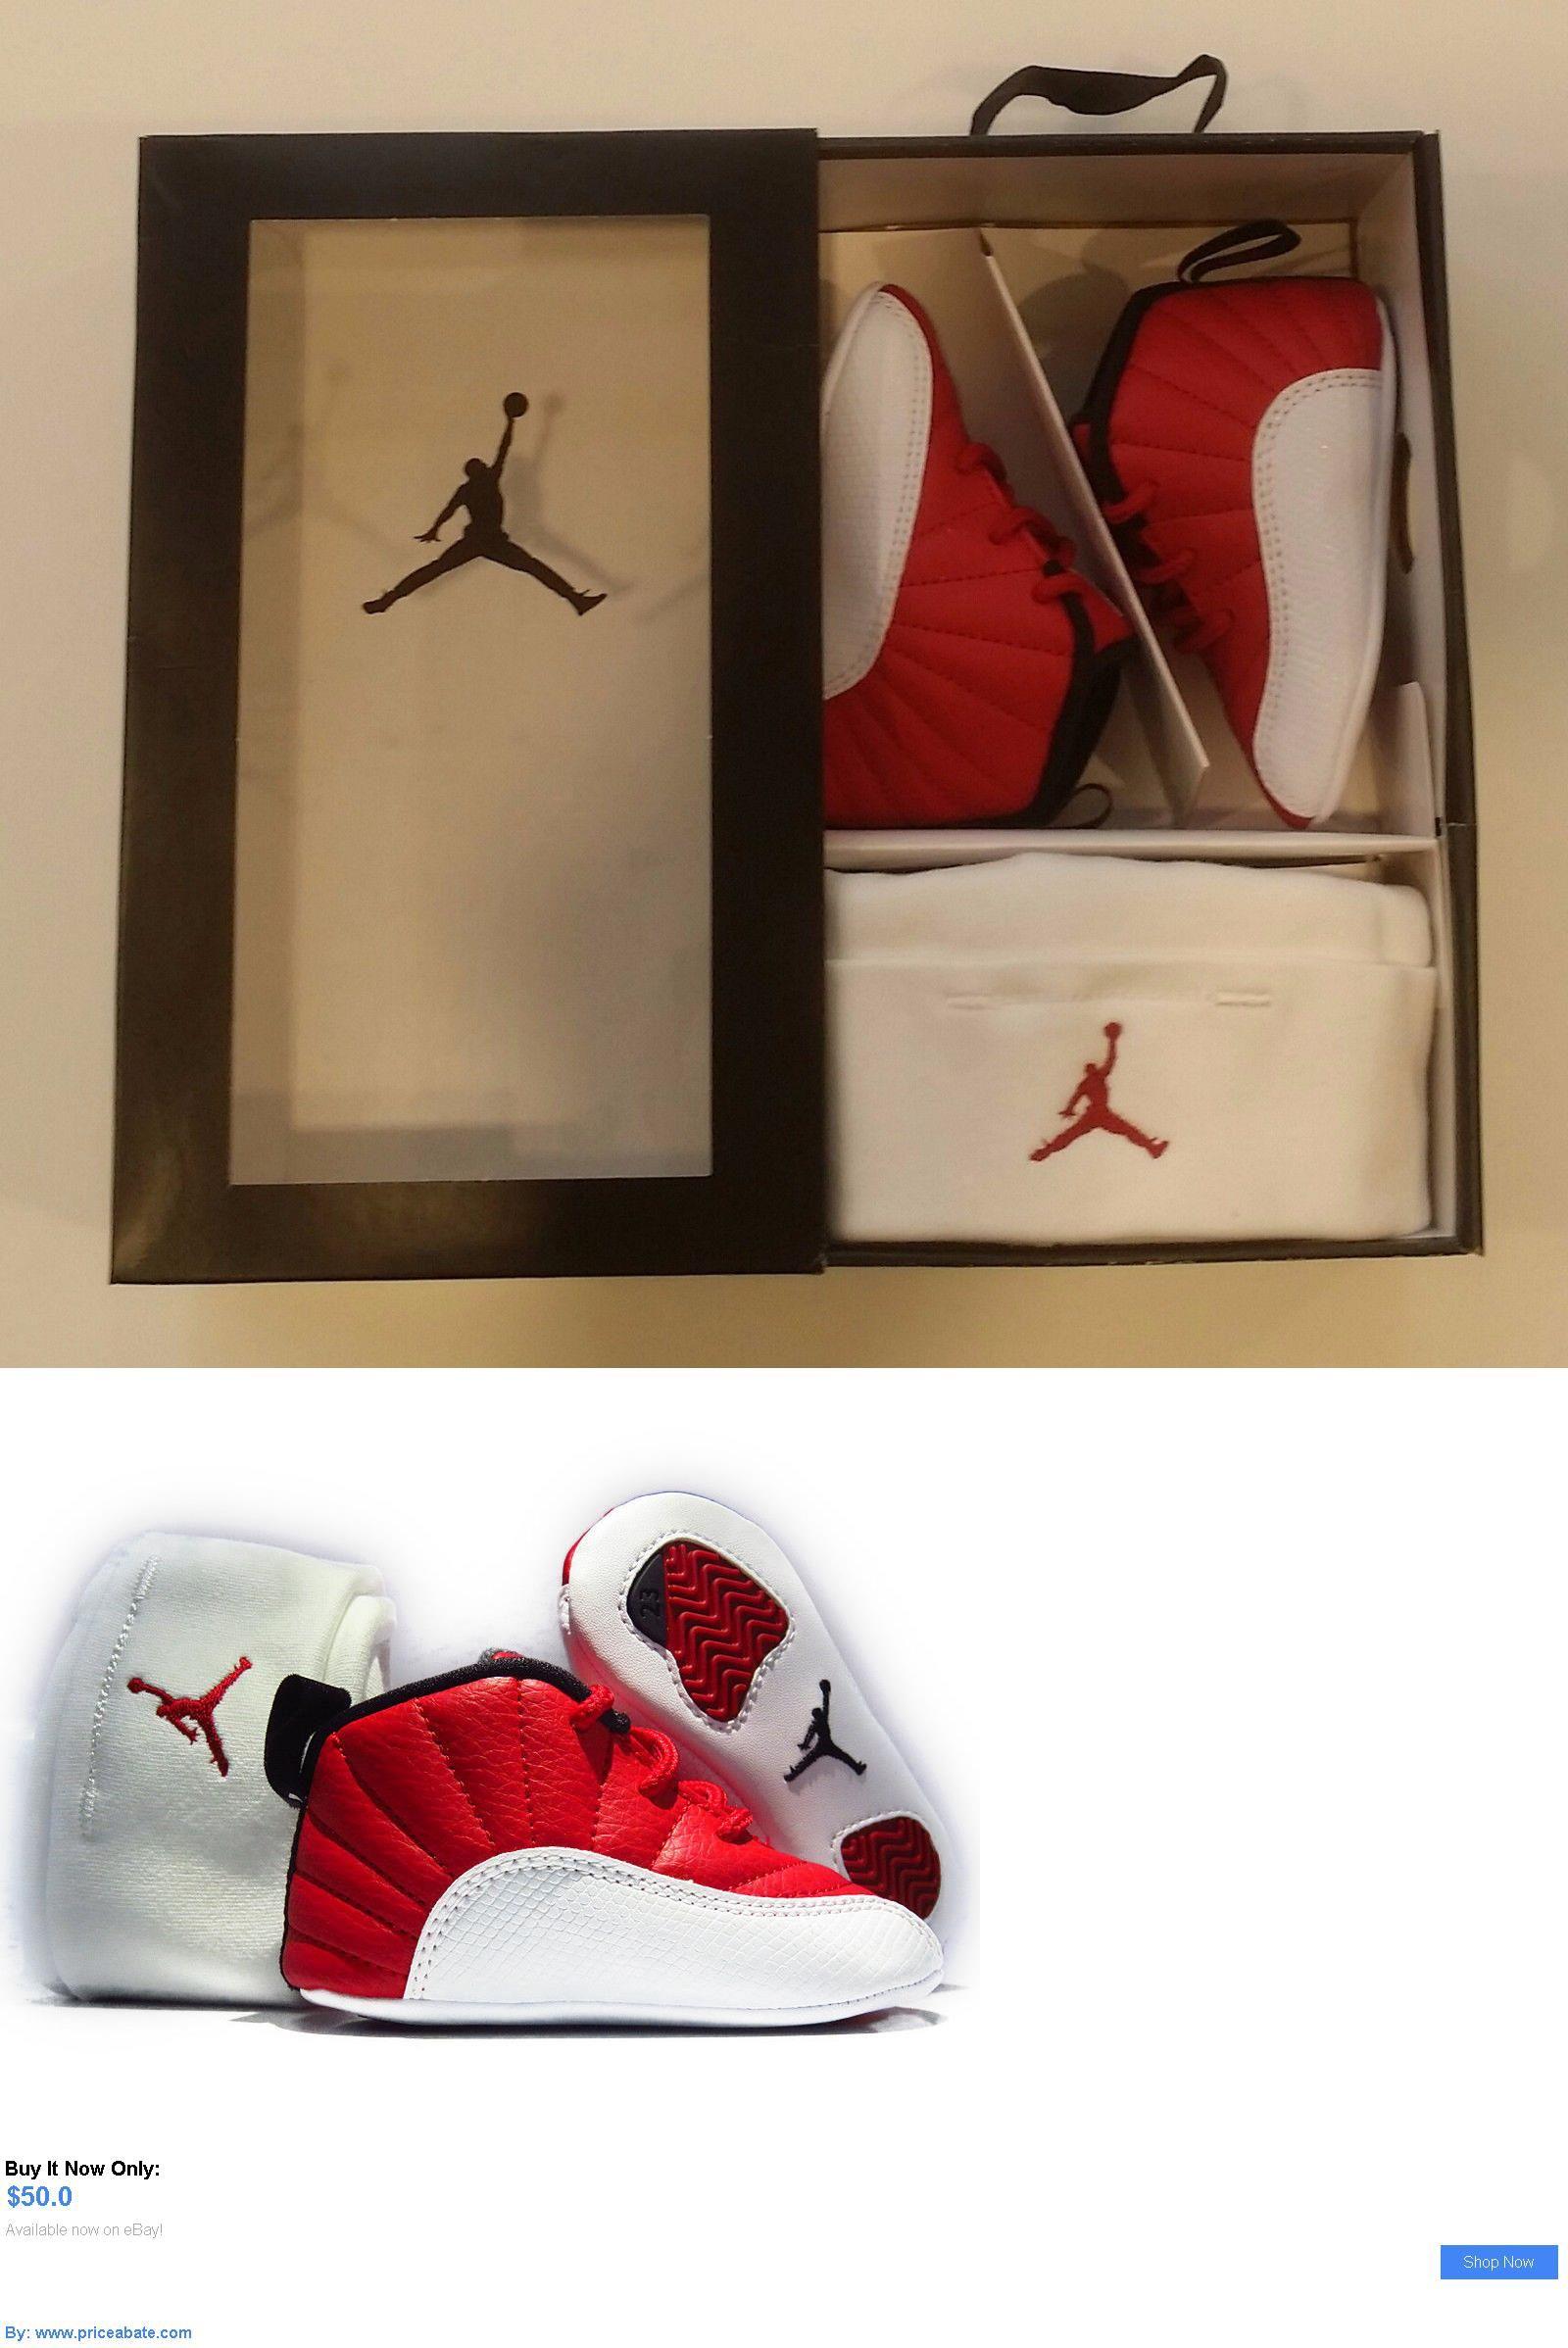 Baby Girls Shoes Air Jordan 12 Retro 378139 600 Infant Gift Pack